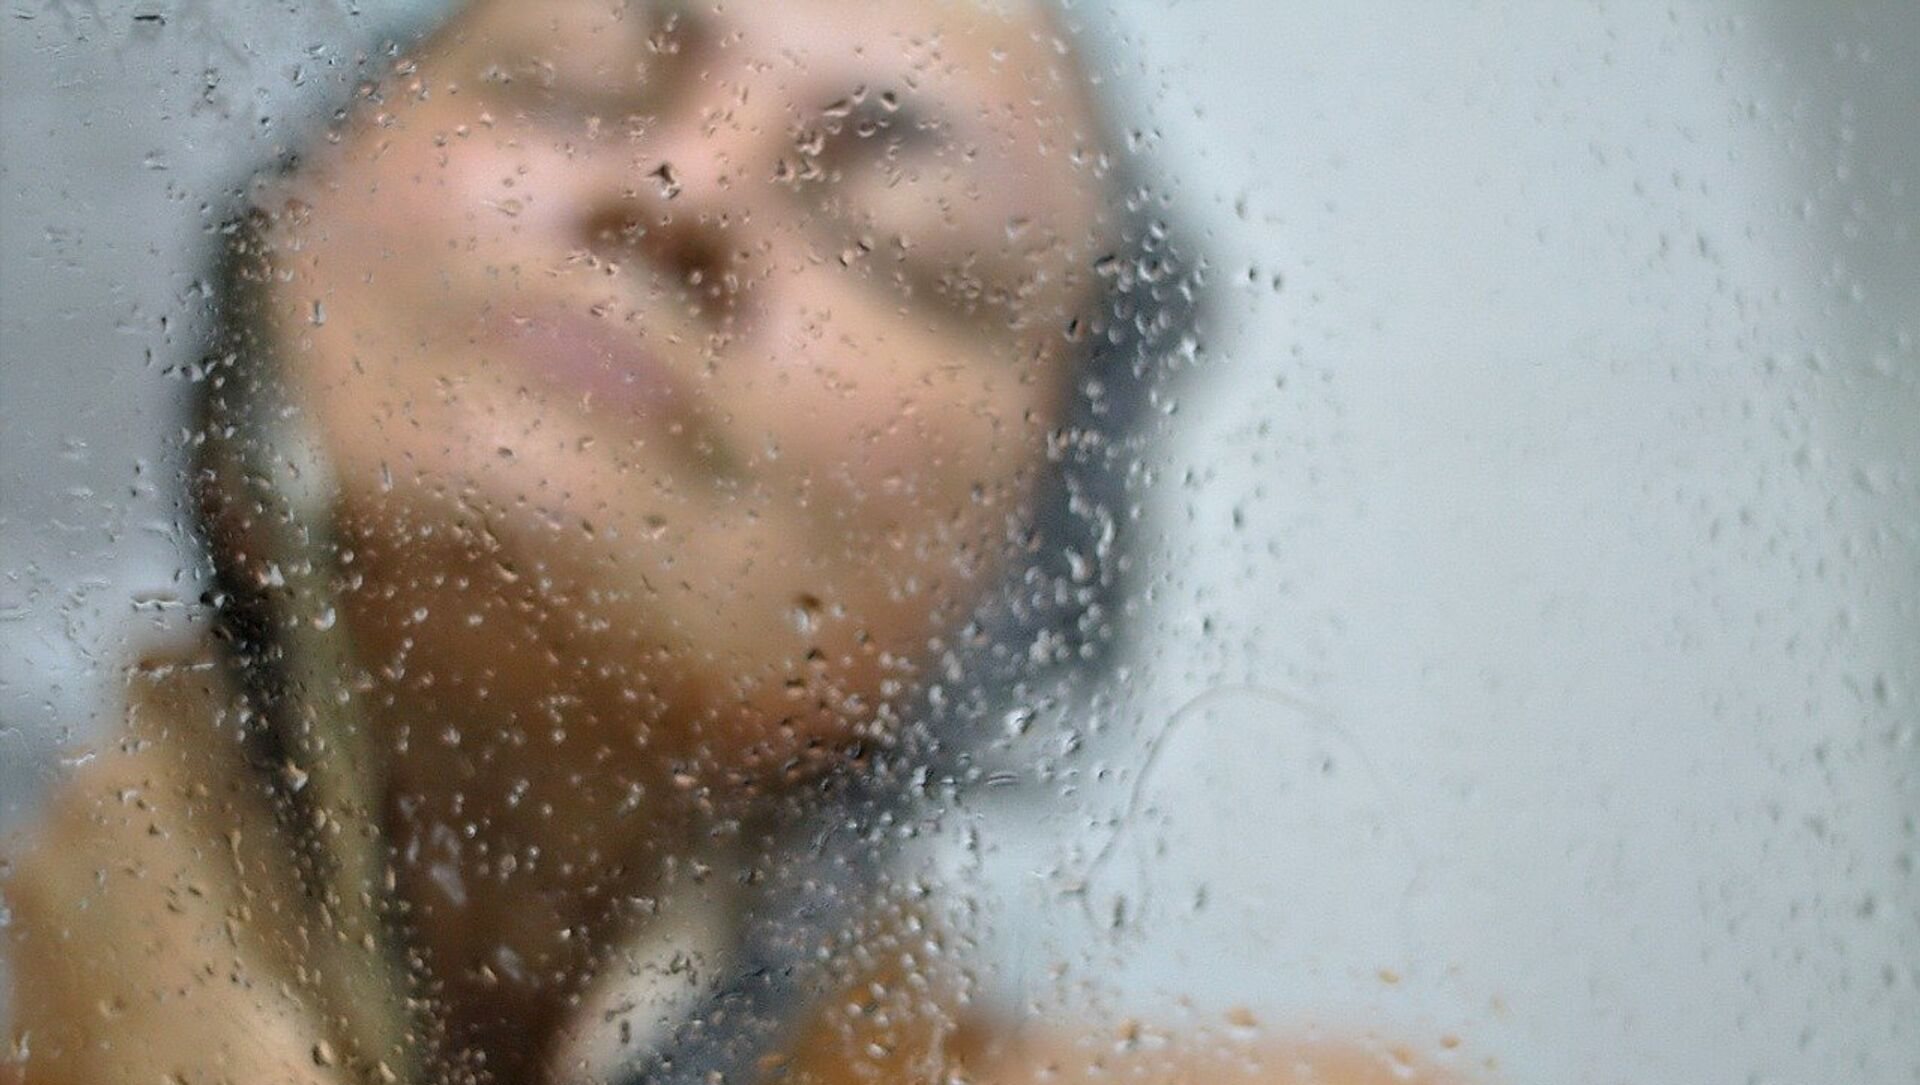 Una mujer en la ducha - Sputnik Mundo, 1920, 05.02.2021